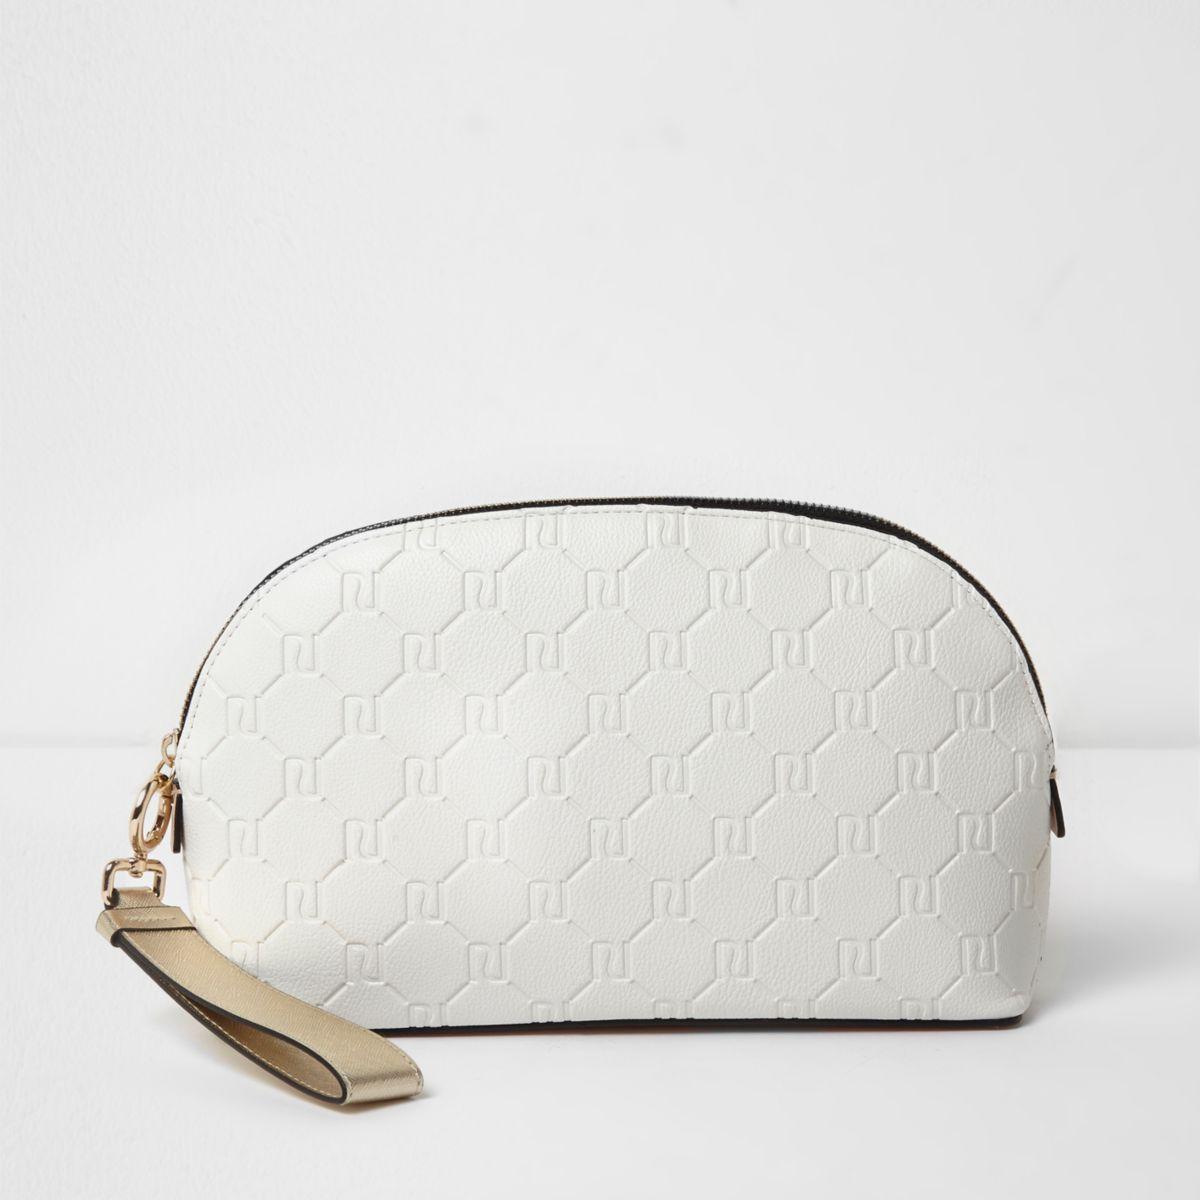 White RI embossed make-up bag